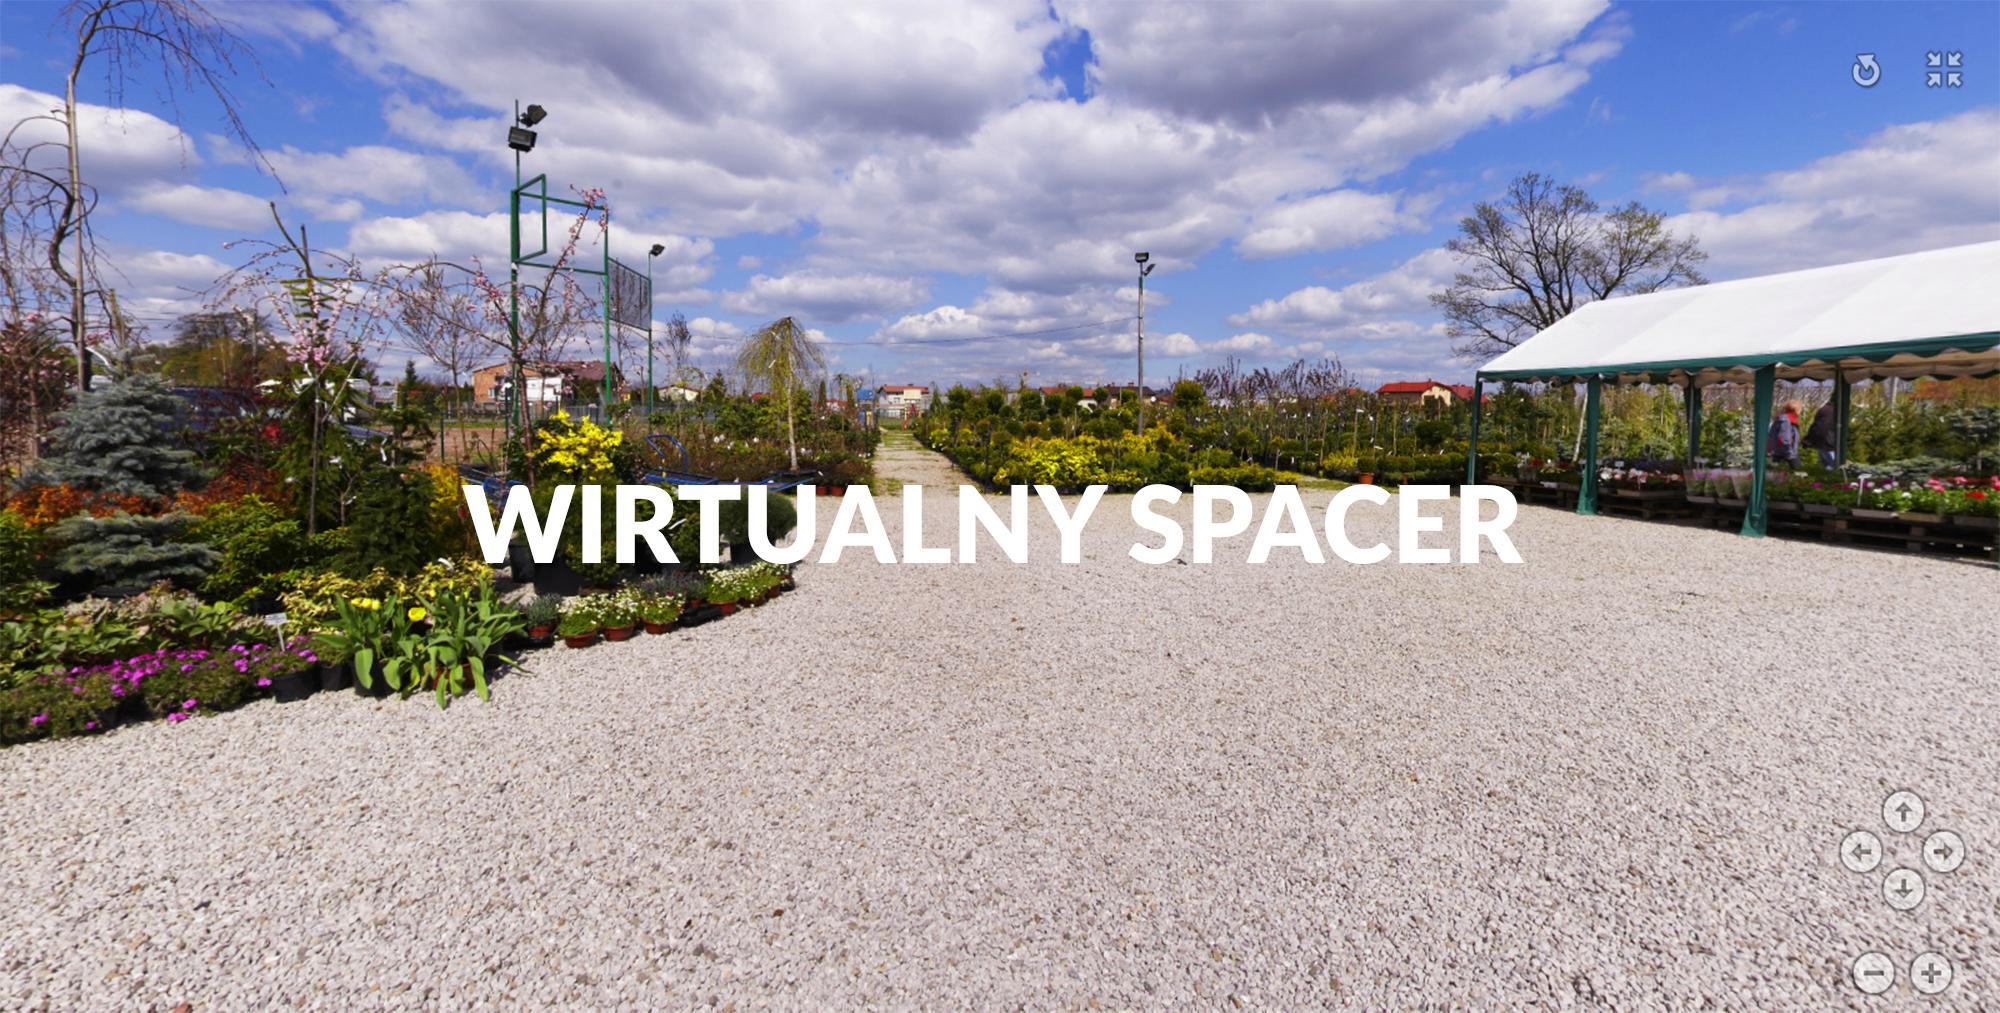 Centrum Ogrodnicze Zielona Kraina